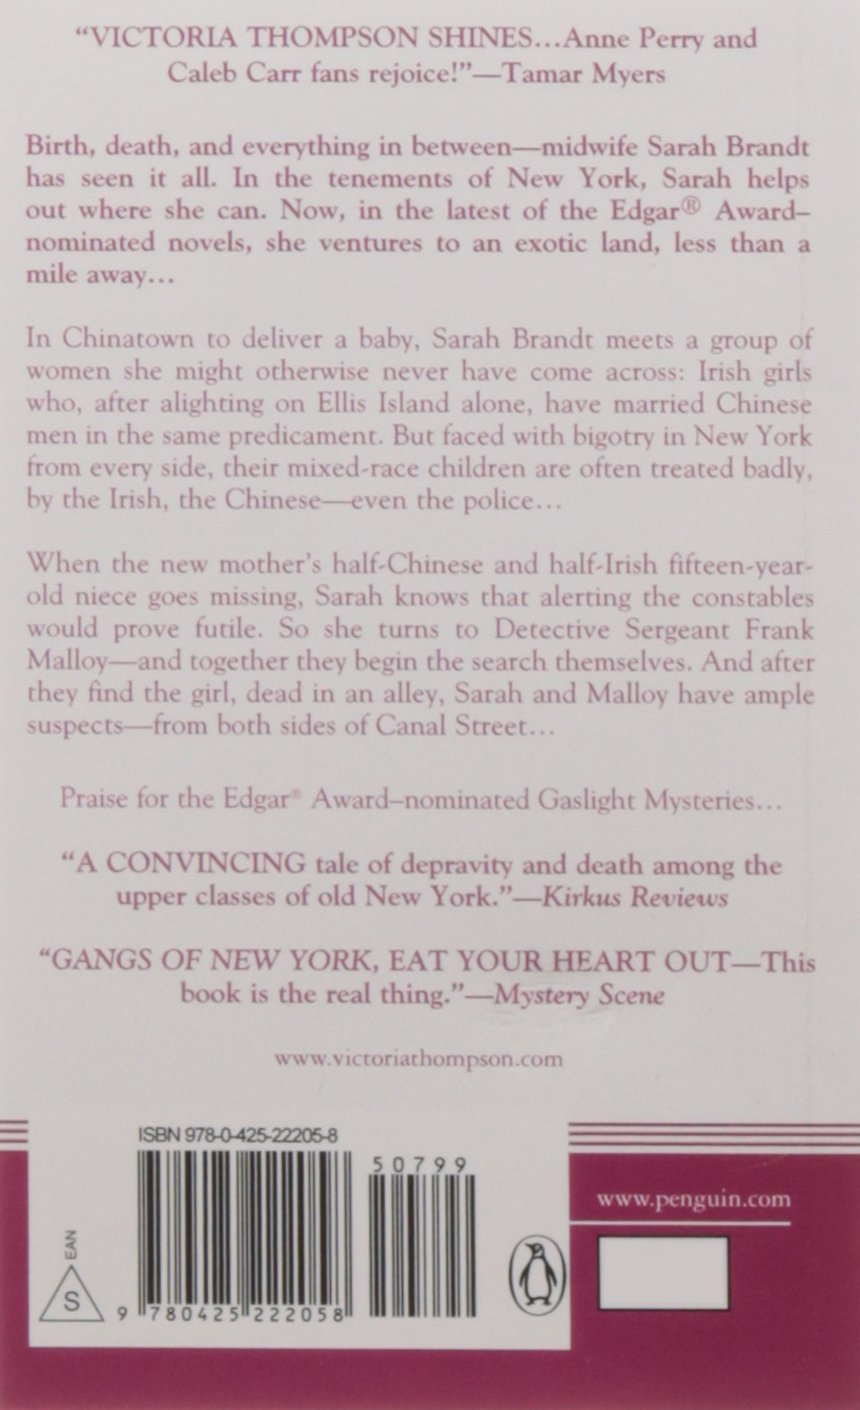 Amazon.com: Murder in Chinatown (A Gaslight Mystery) (9780425222058 ...